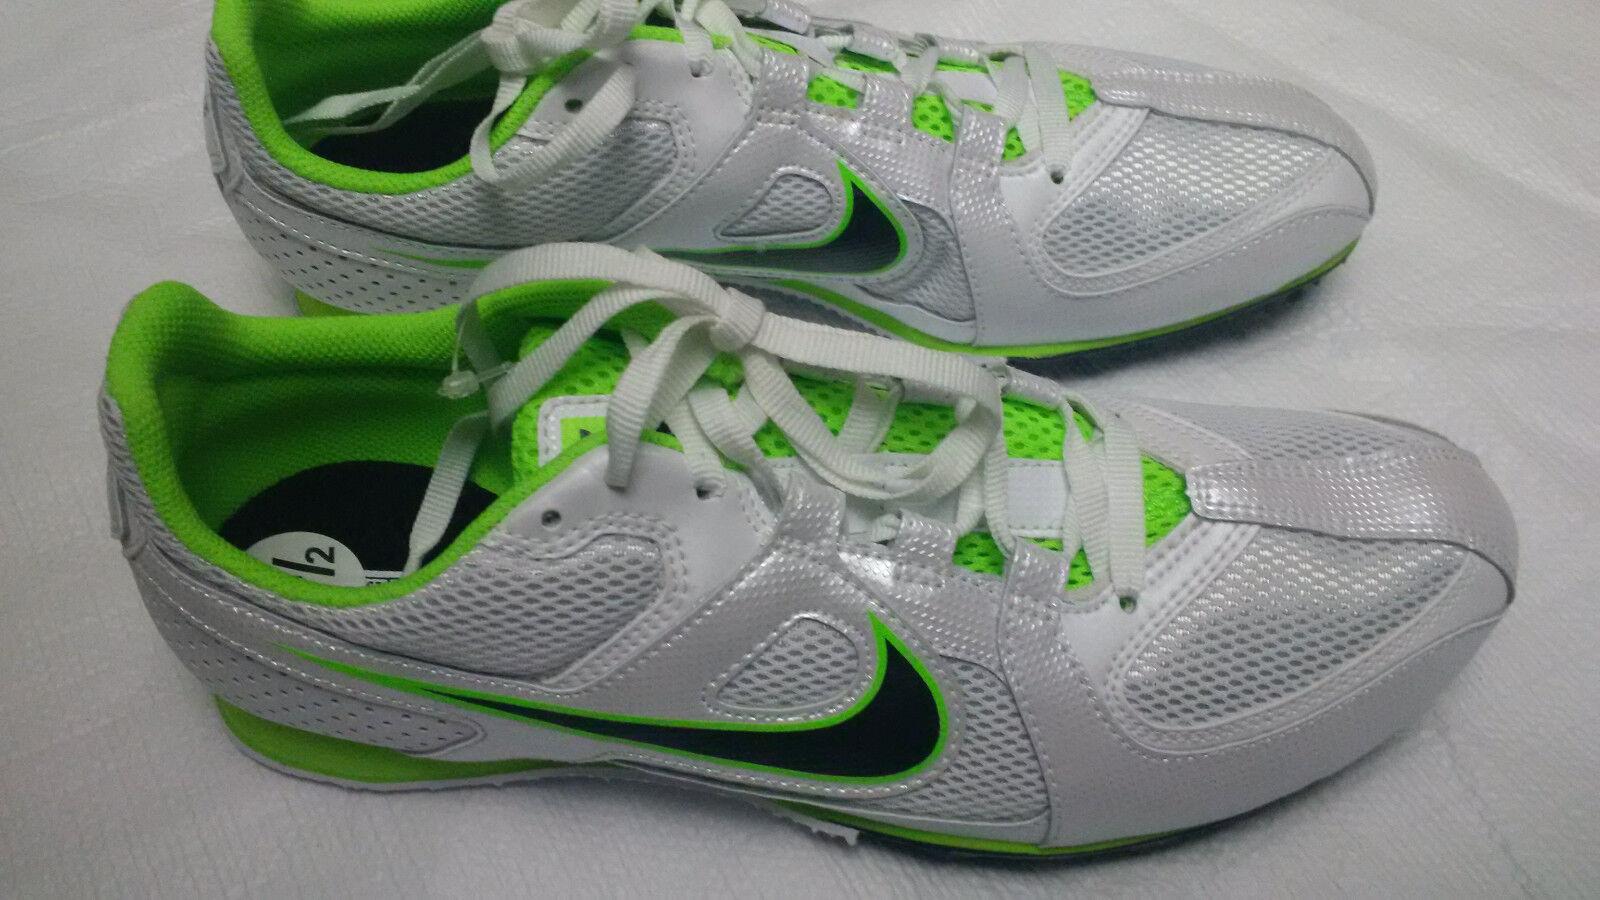 nike zoom rivale medio 6 da  -  running scarpe -  style 468648-103 9772b6